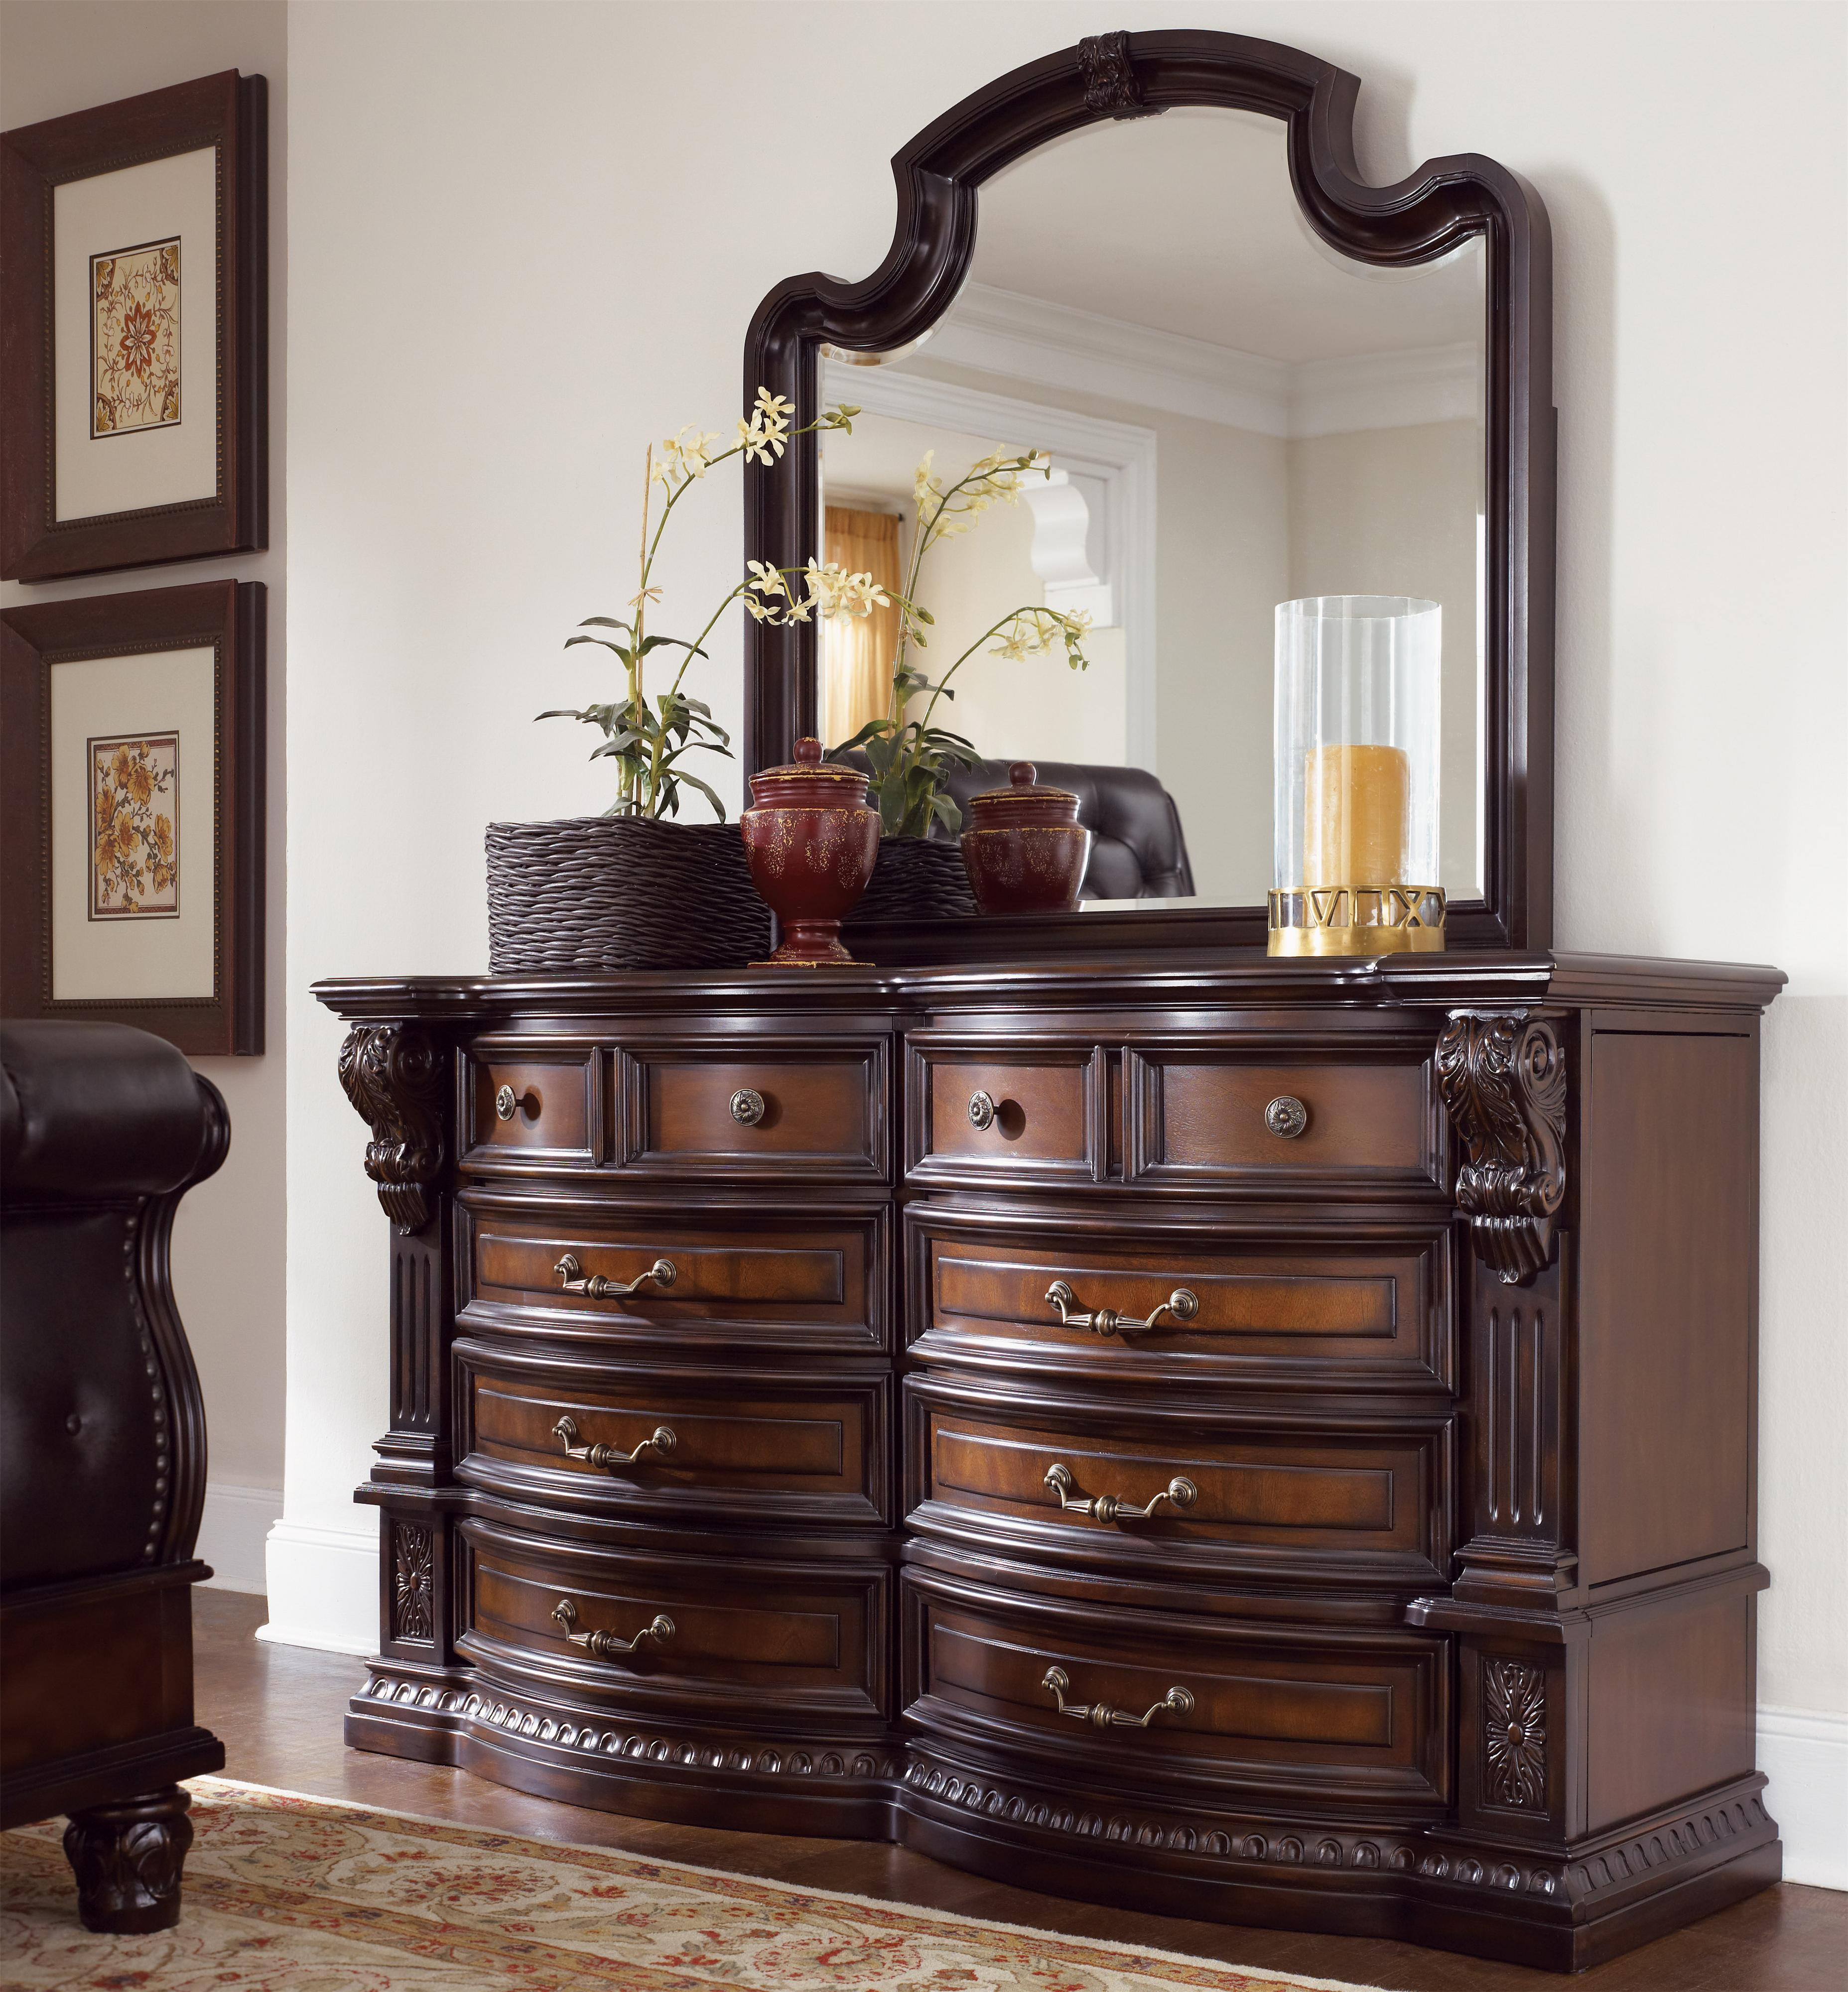 Fairmont Designs Dresser